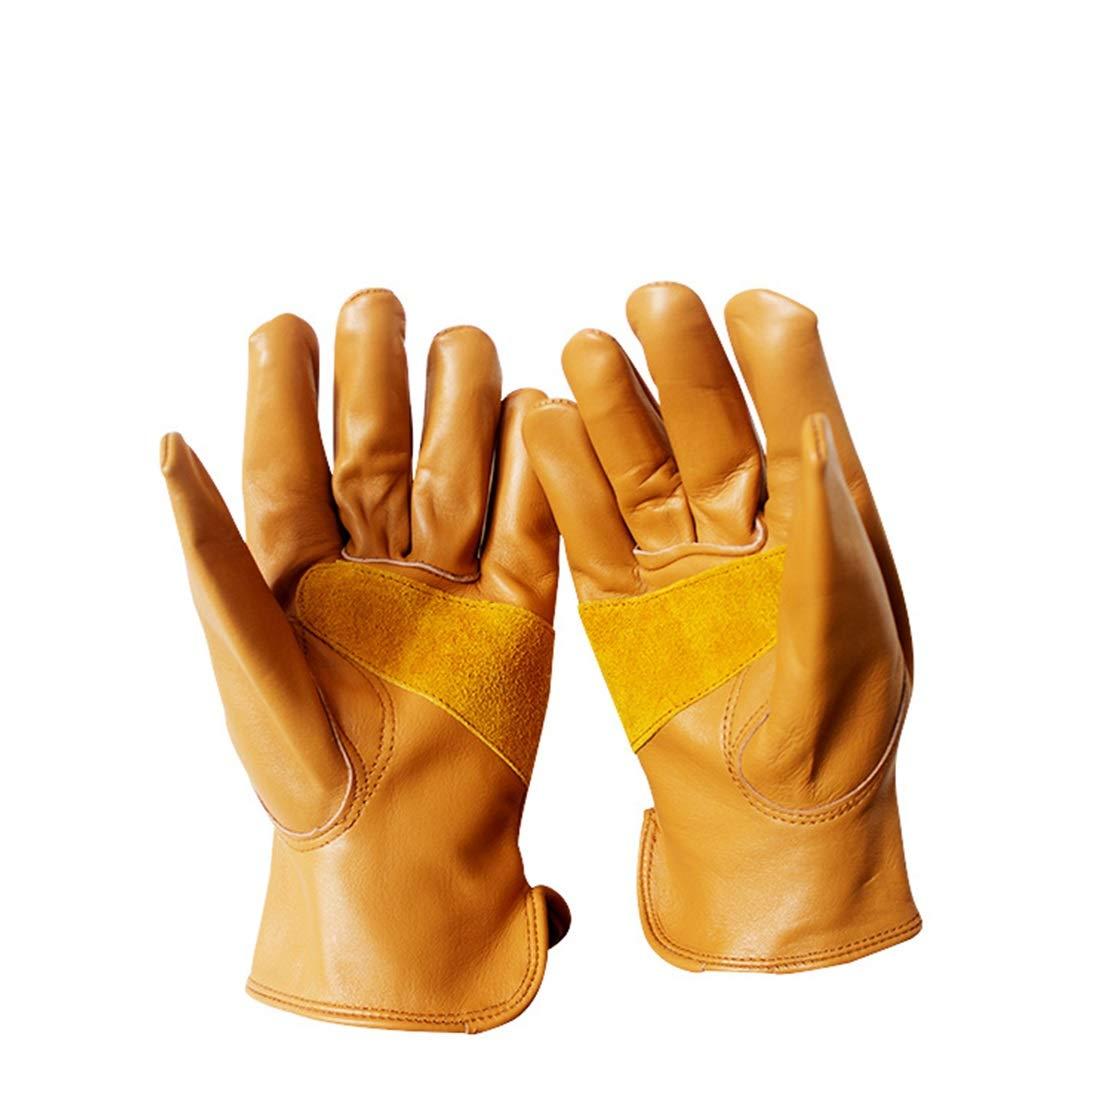 JESSIEKERVIN YY3 Outdoor Riding Handschuhe Braun Leder Fahrer Handschuhe Short Style Vollleder Soft Wear Resistant Handschuhe